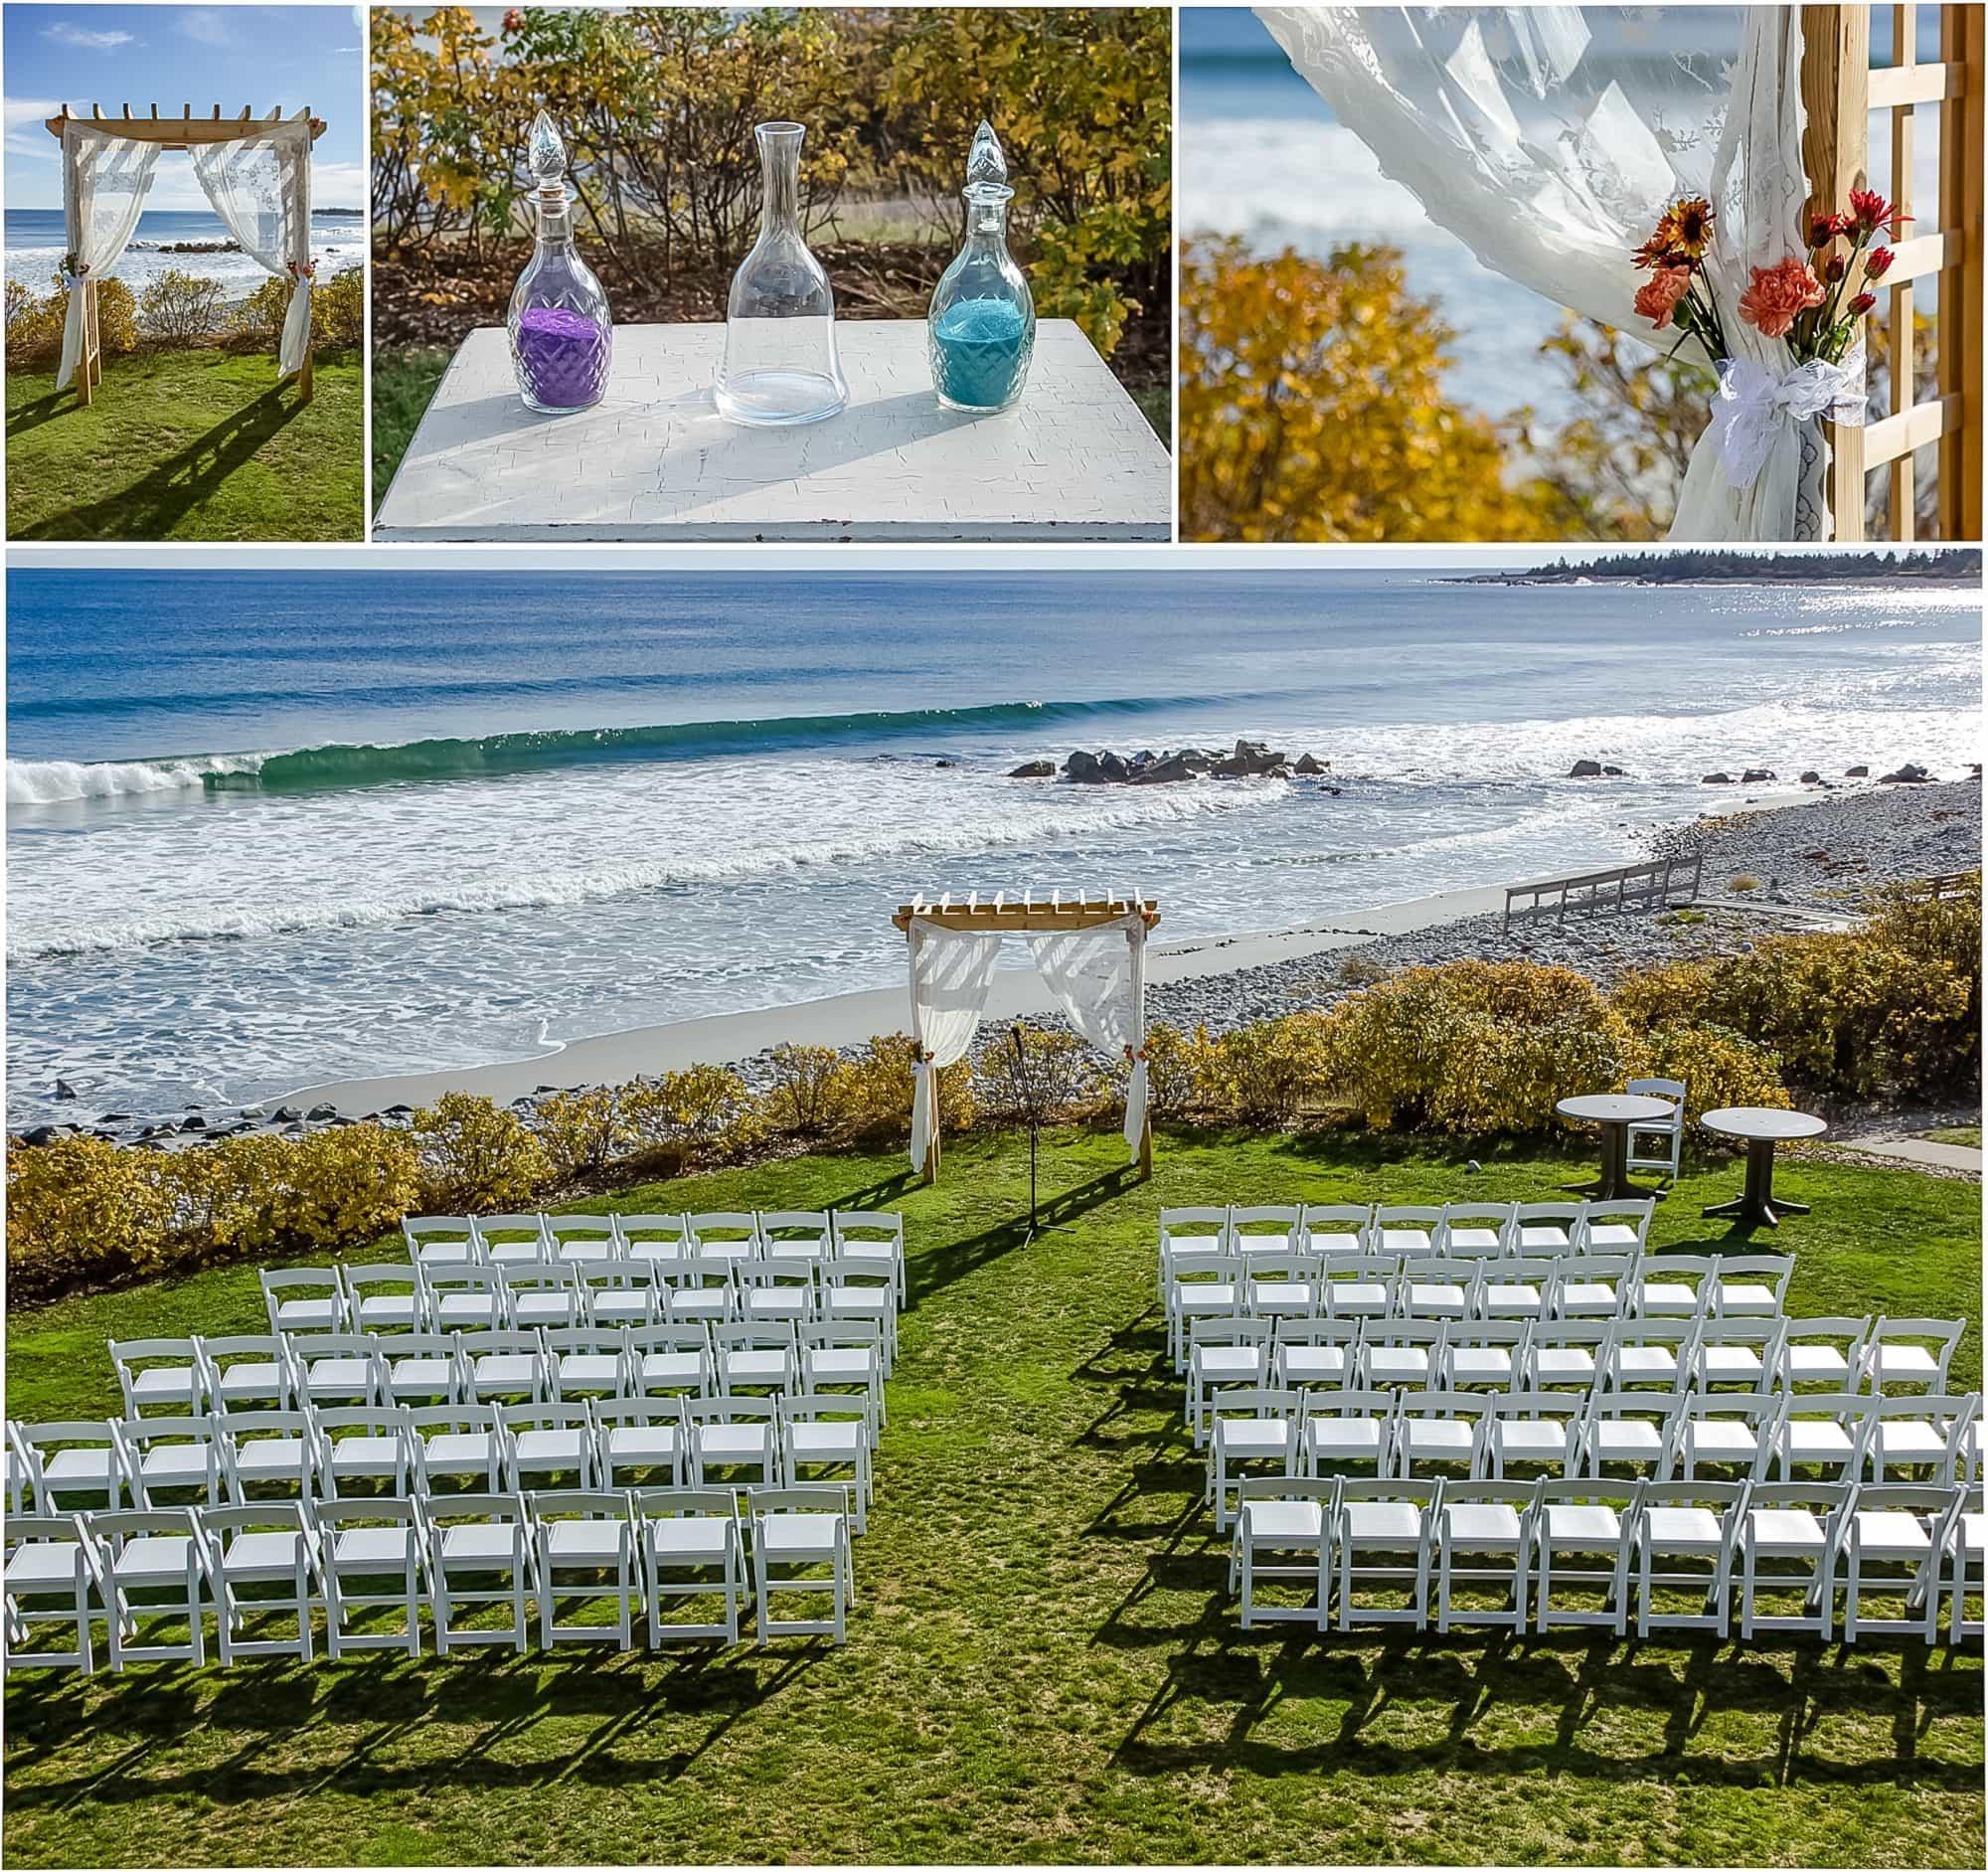 Oceanside White Point Beach Wedding Ceremony Setup.